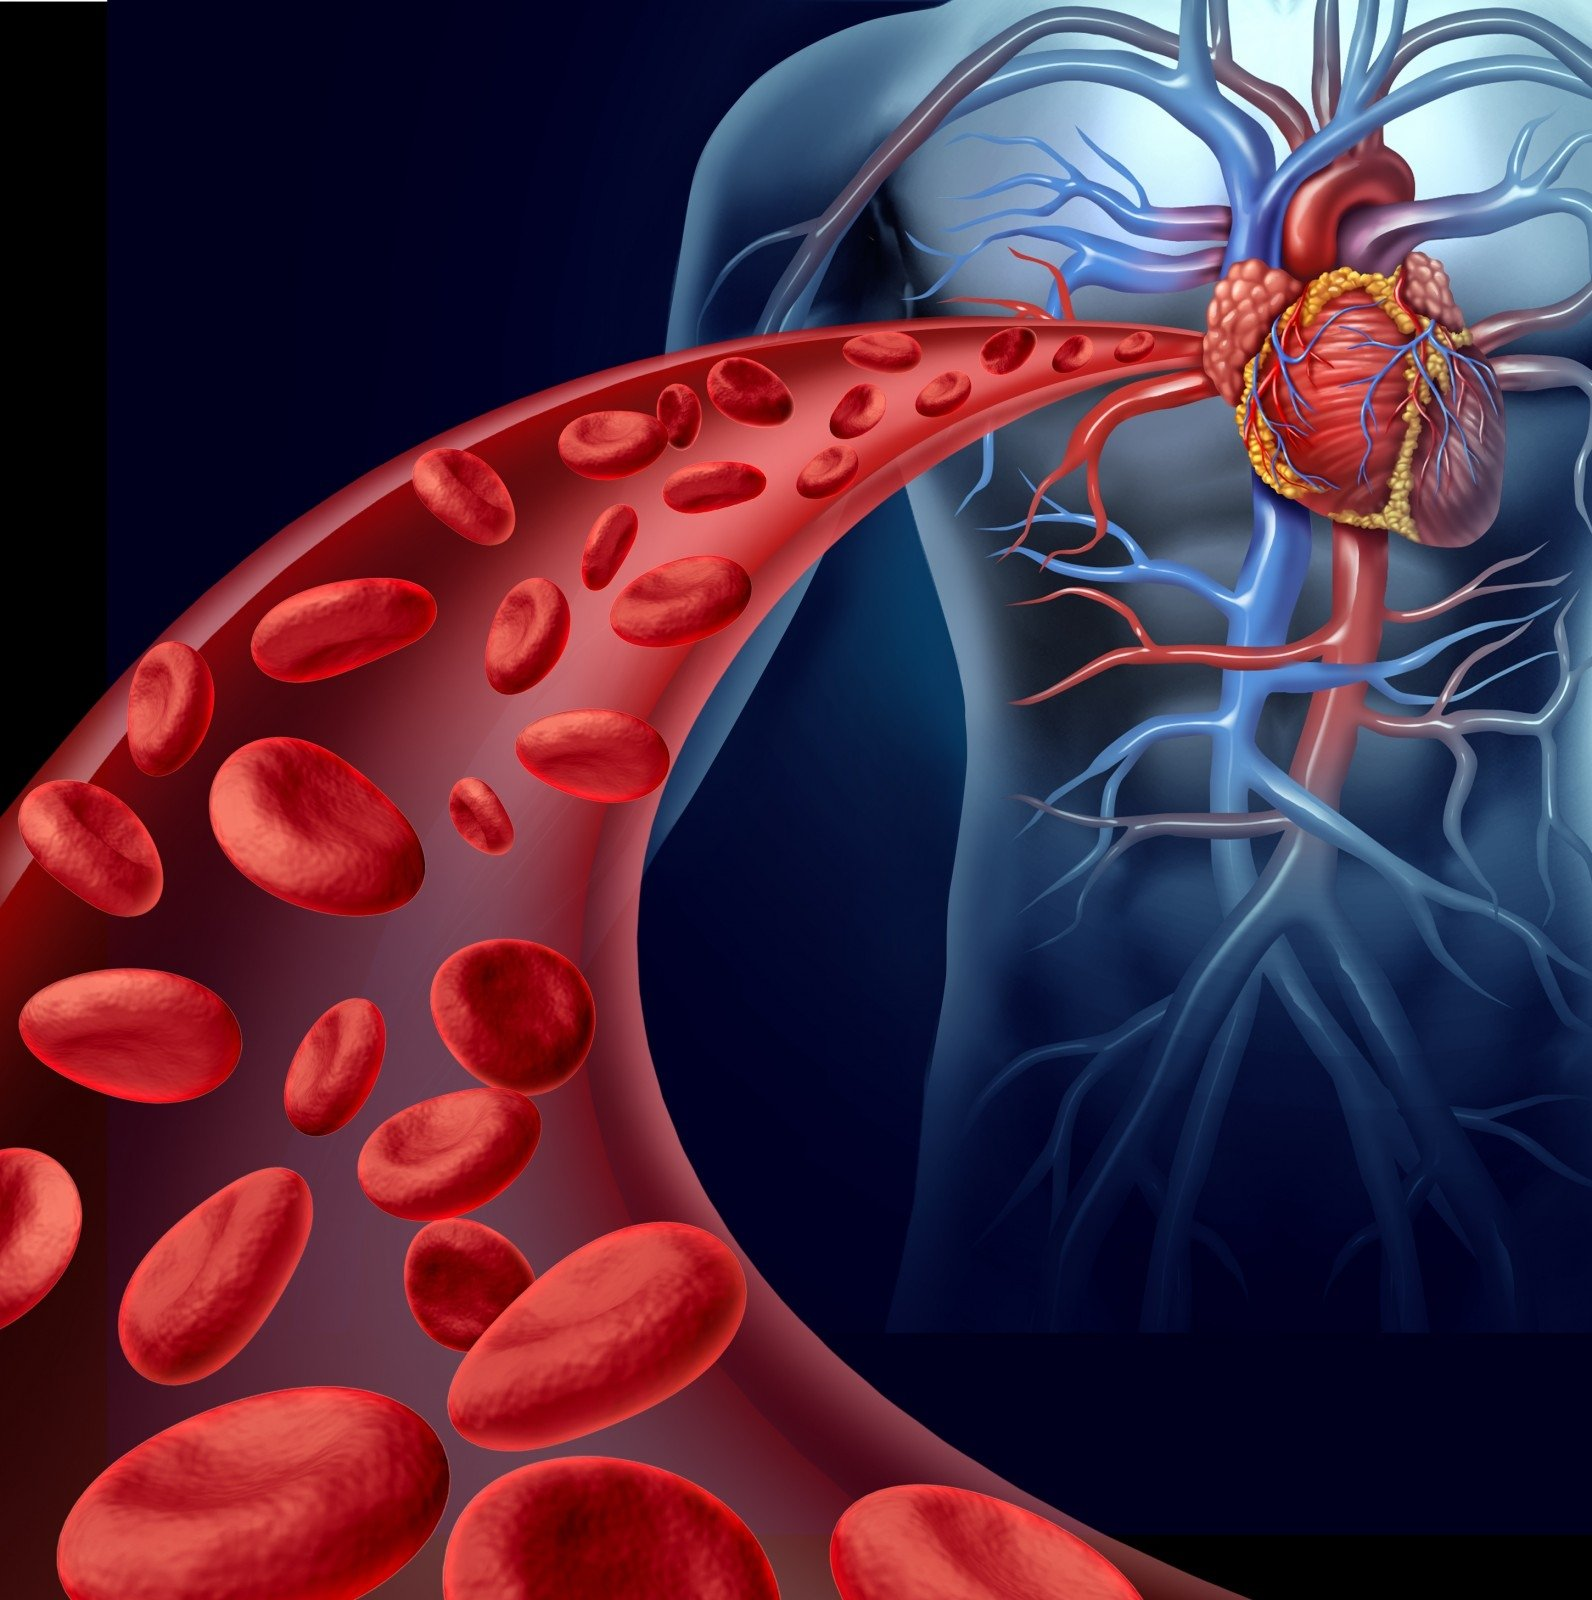 ar pirtis naudinga sergant hipertenzija